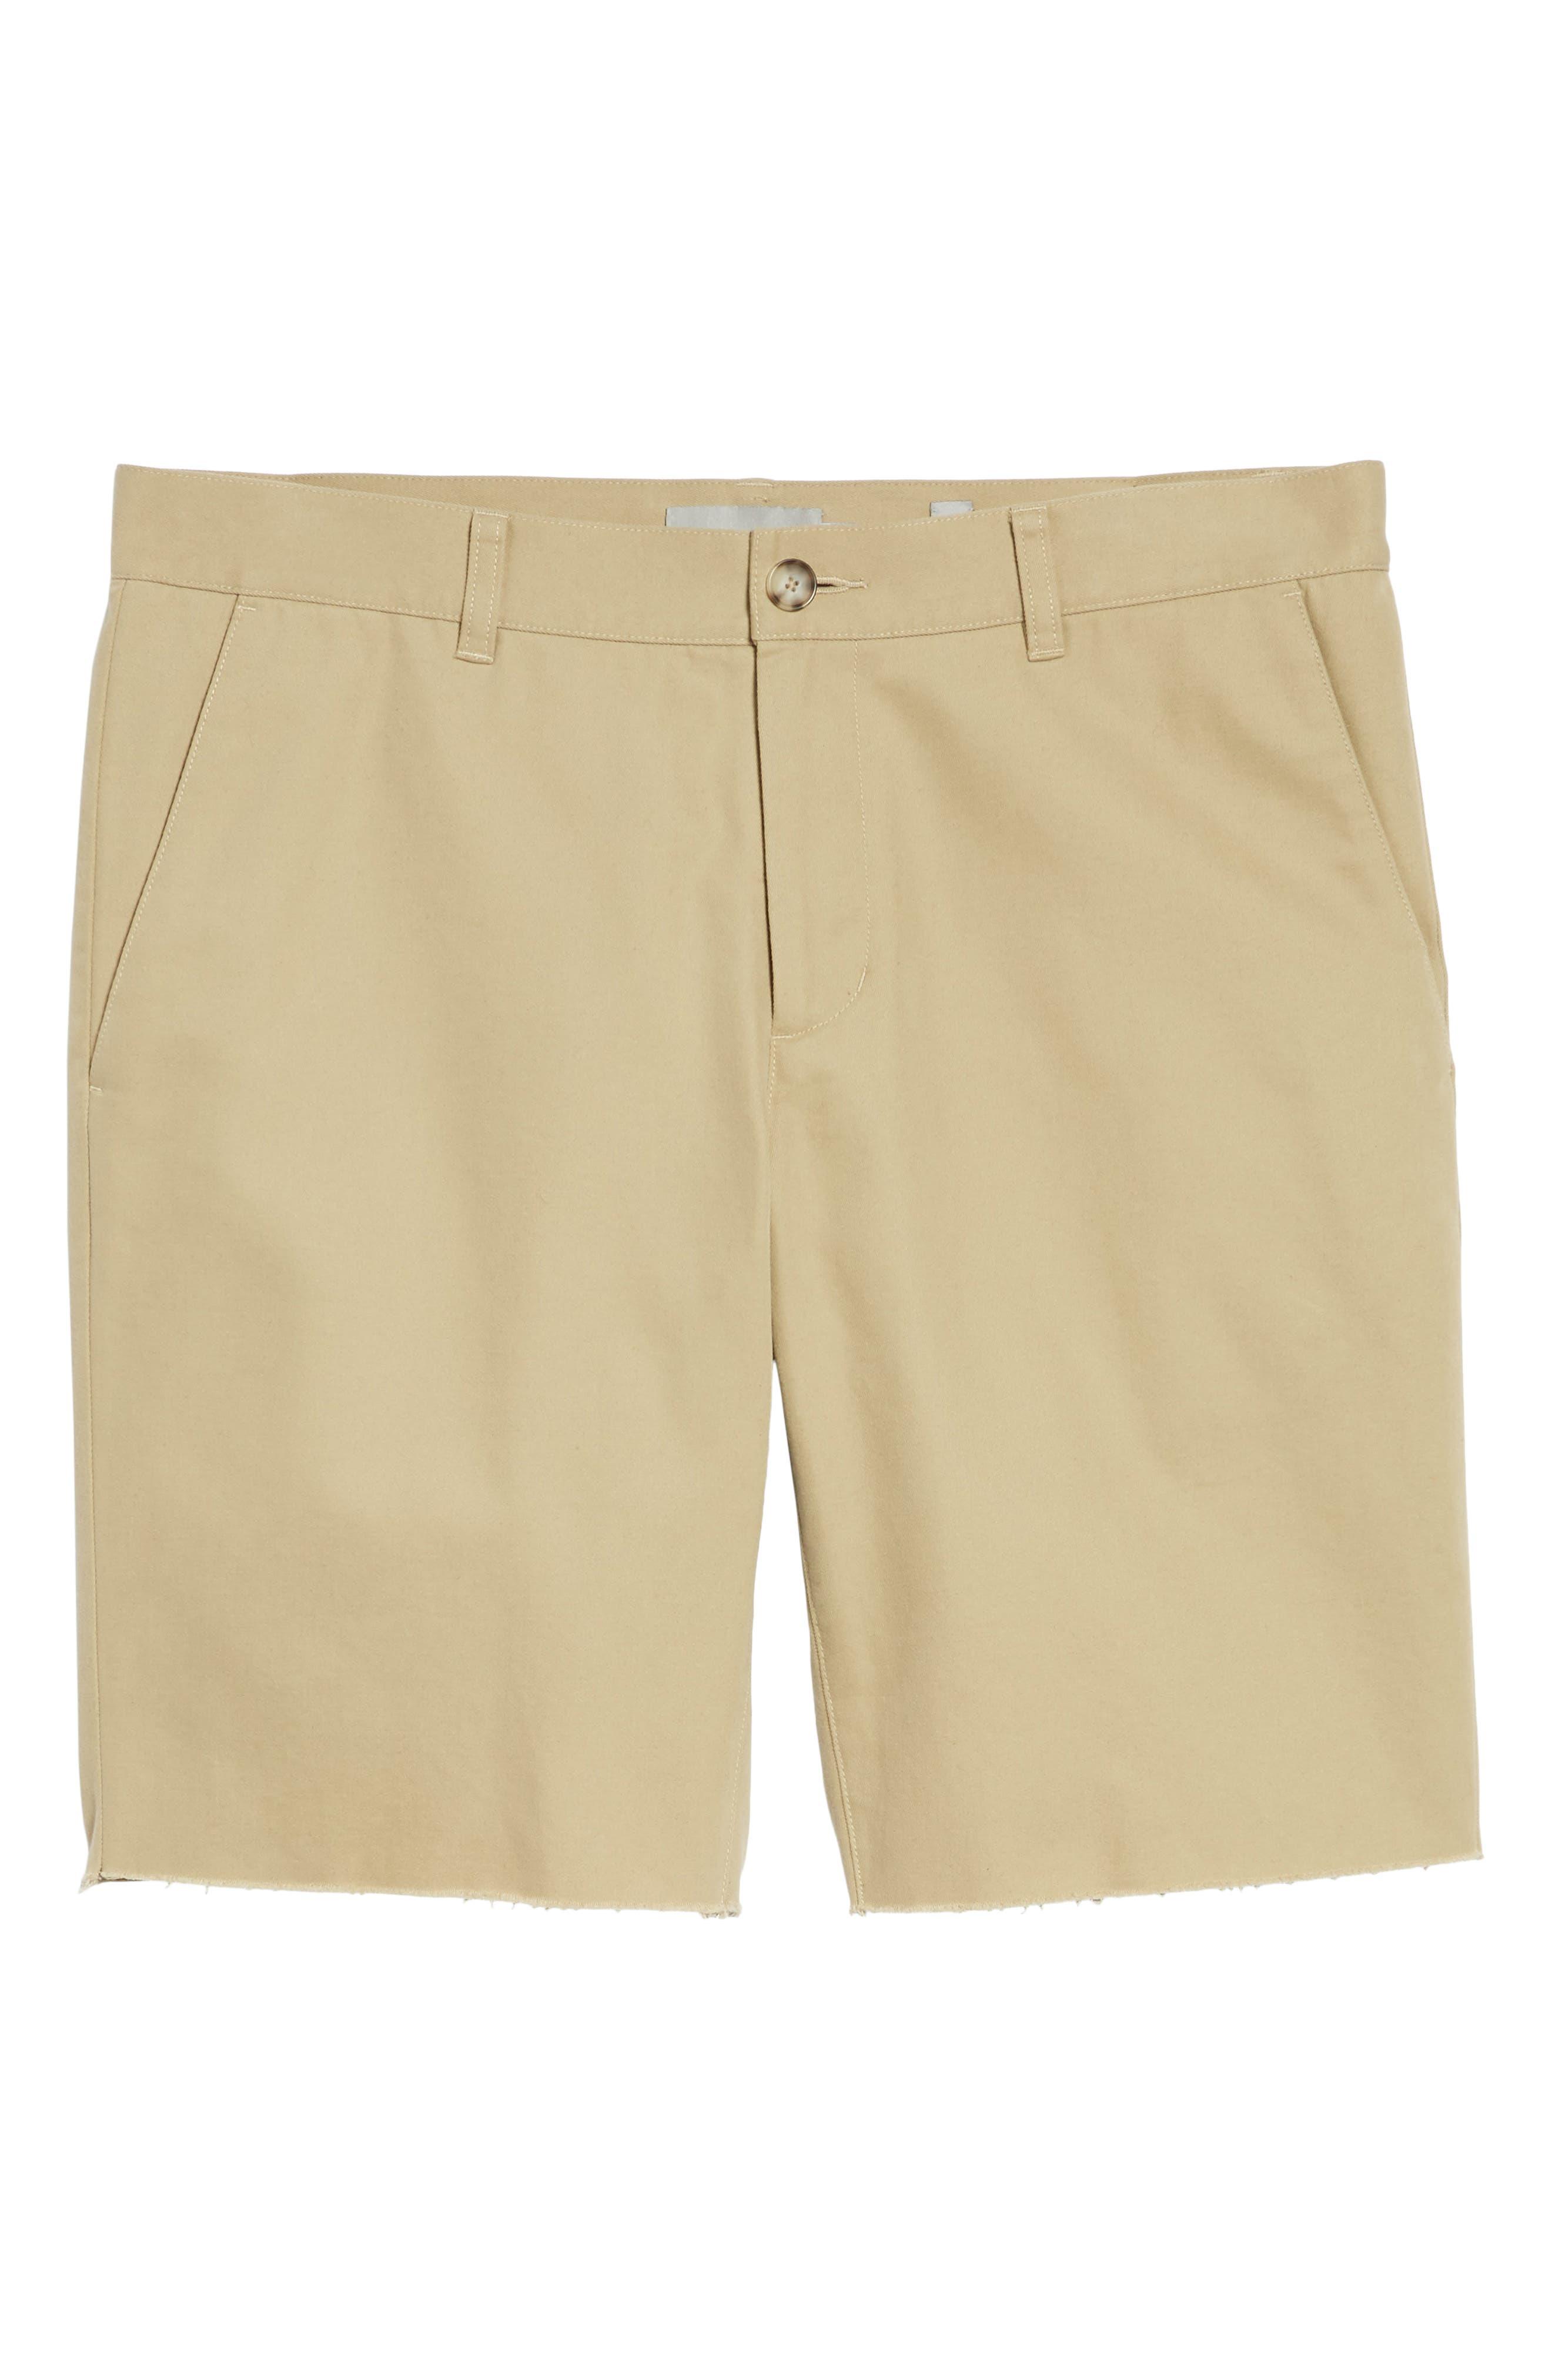 Slim Fit Chino Shorts,                             Alternate thumbnail 6, color,                             250